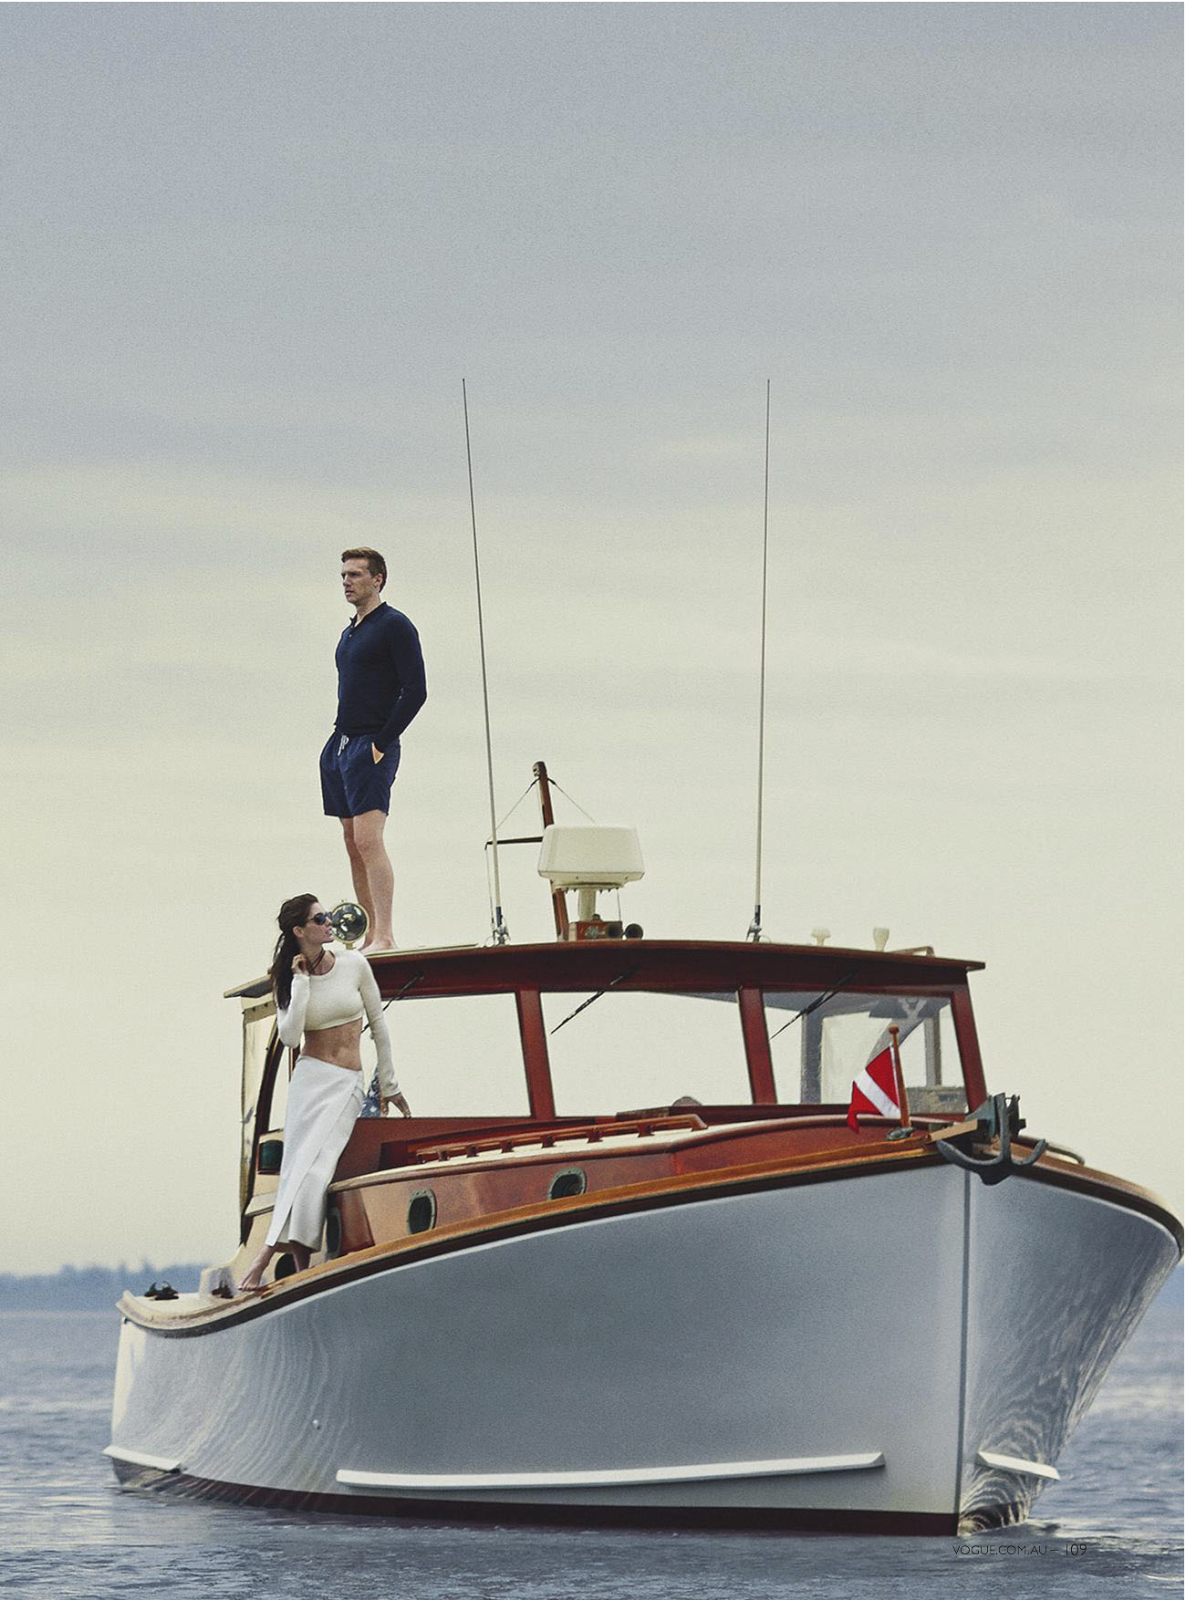 2553 best tekneler ve Yatlar images on Pinterest | Boats, Ships ...